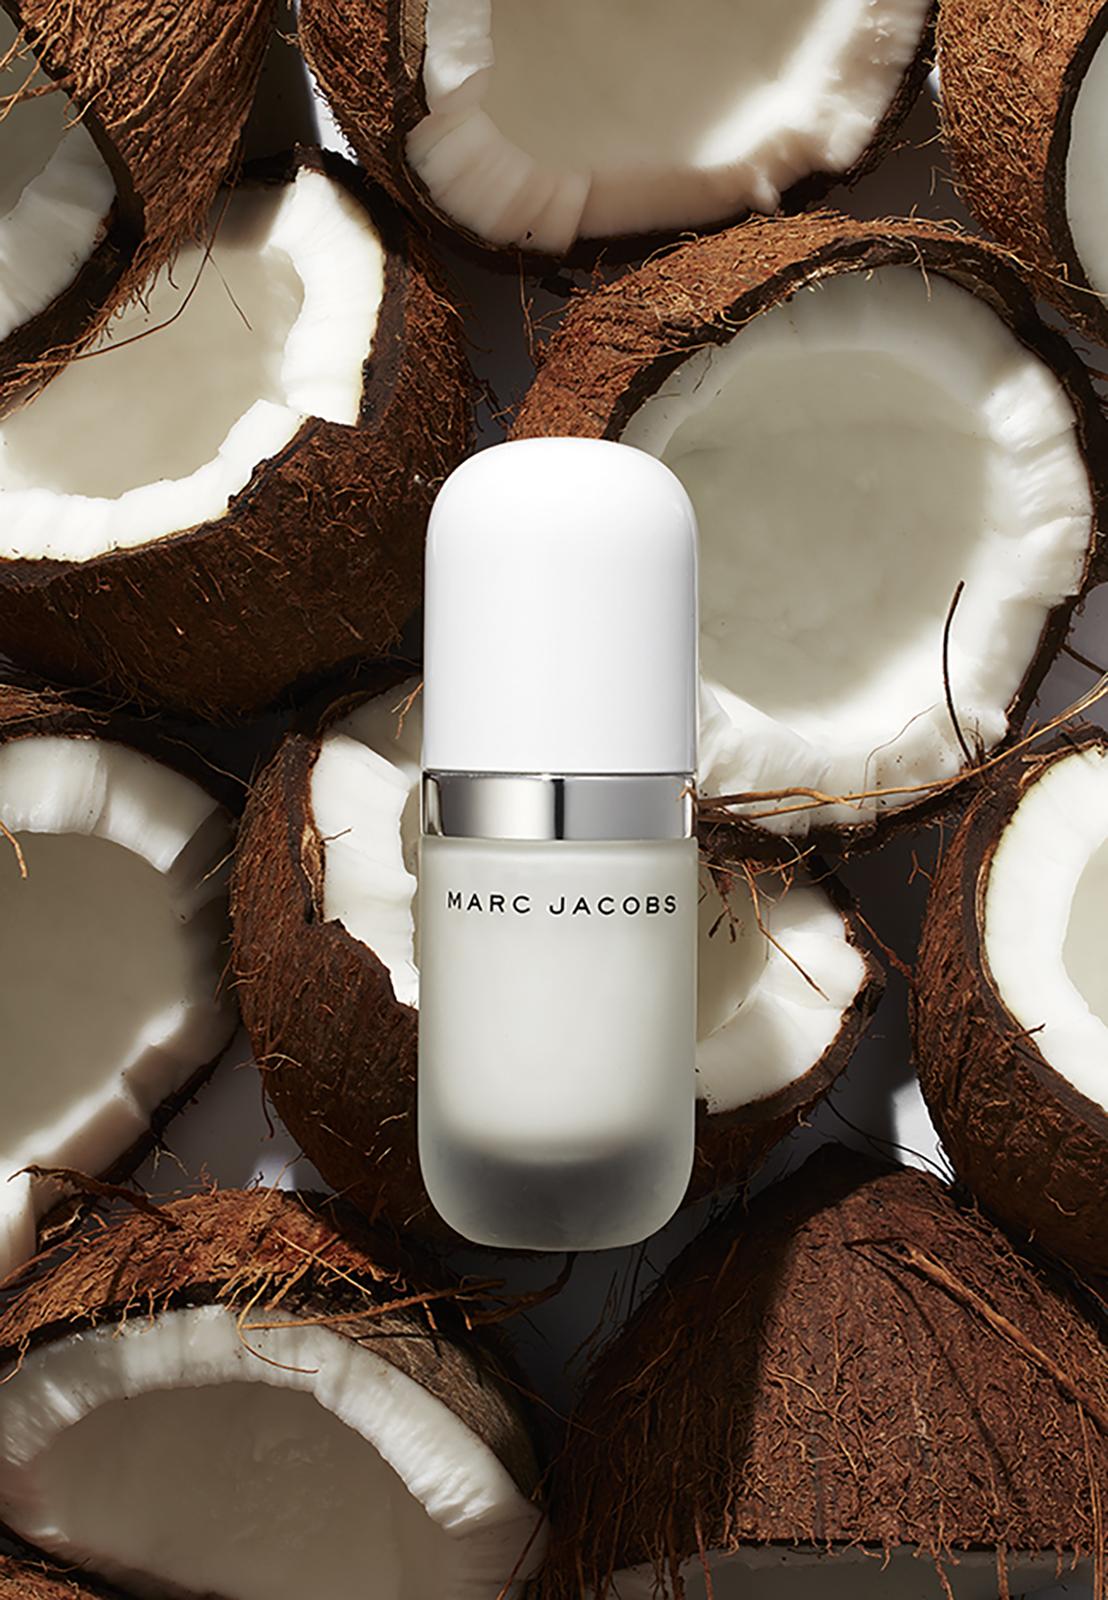 Marc Jacobs Coconut